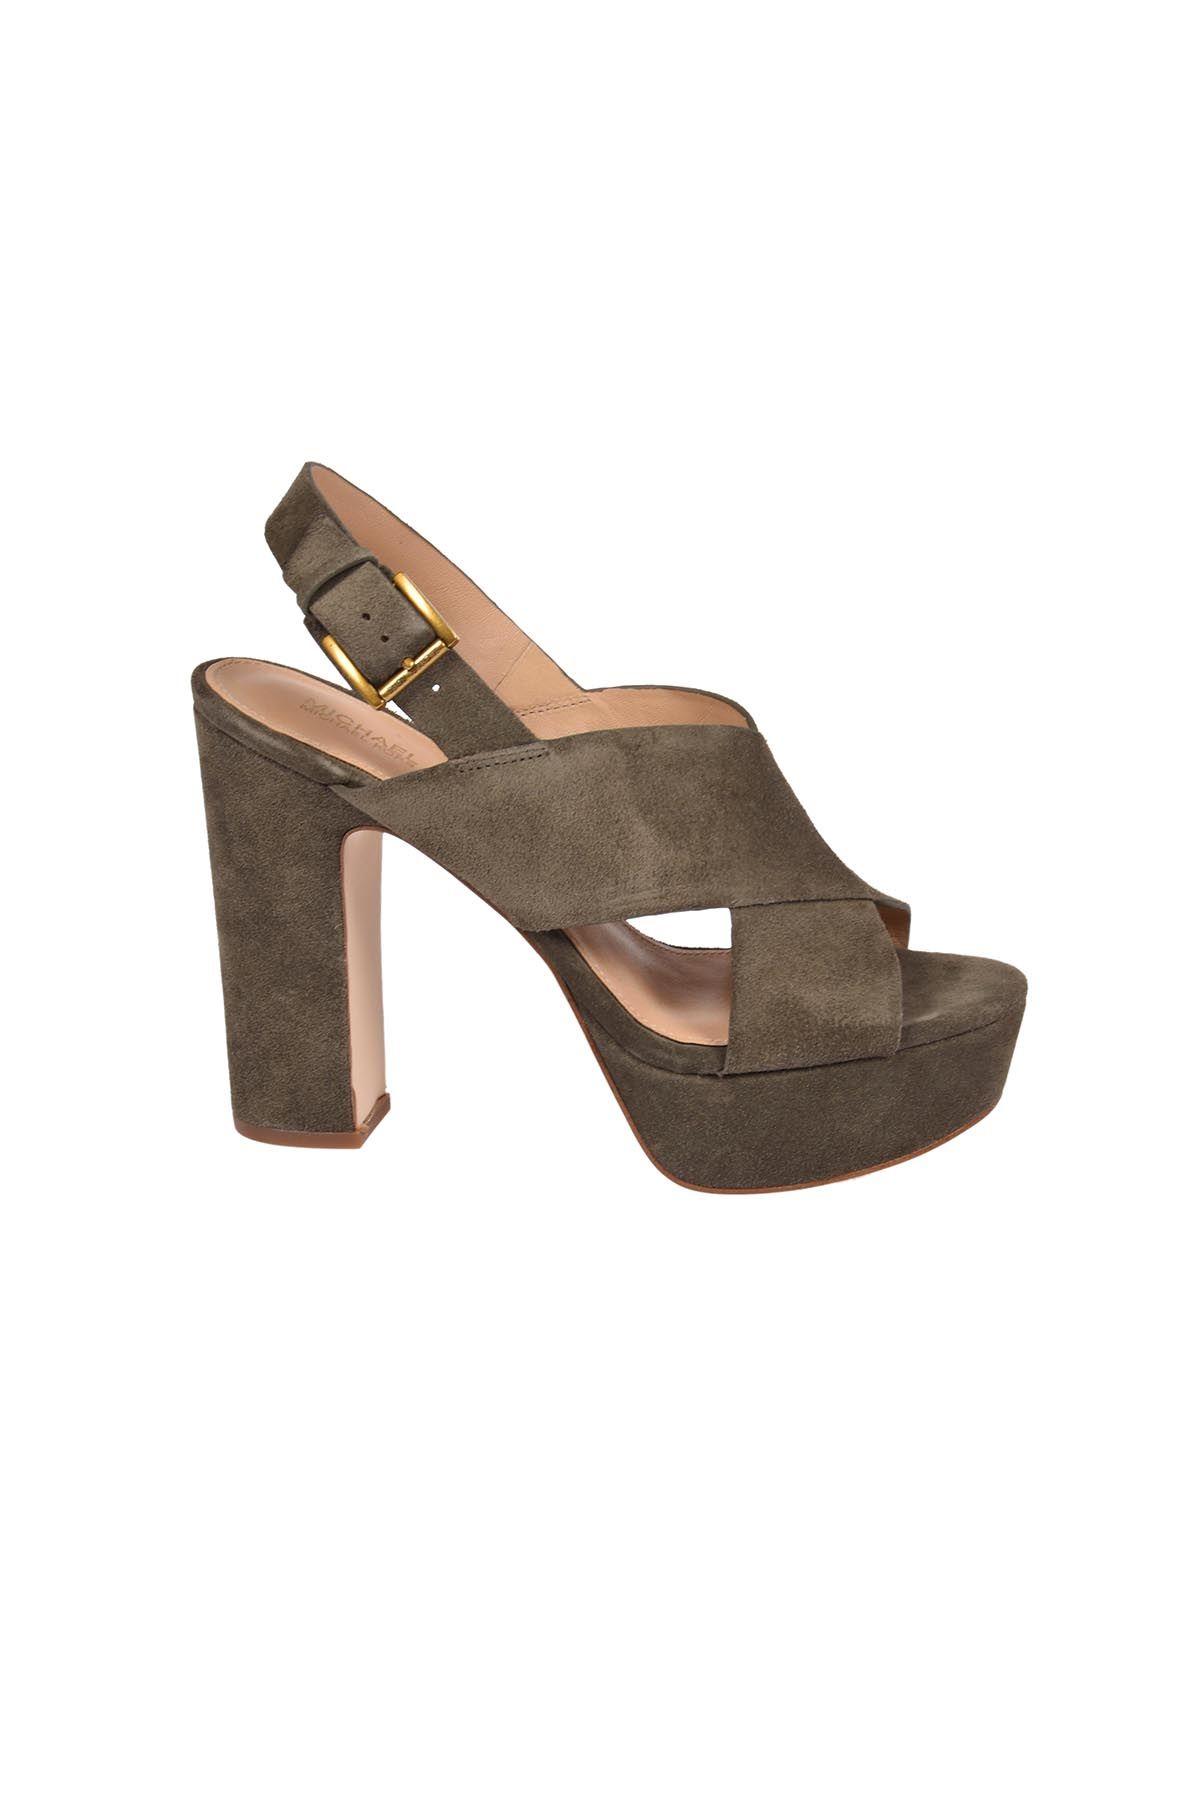 Michael Kors Marina Platform Sandals